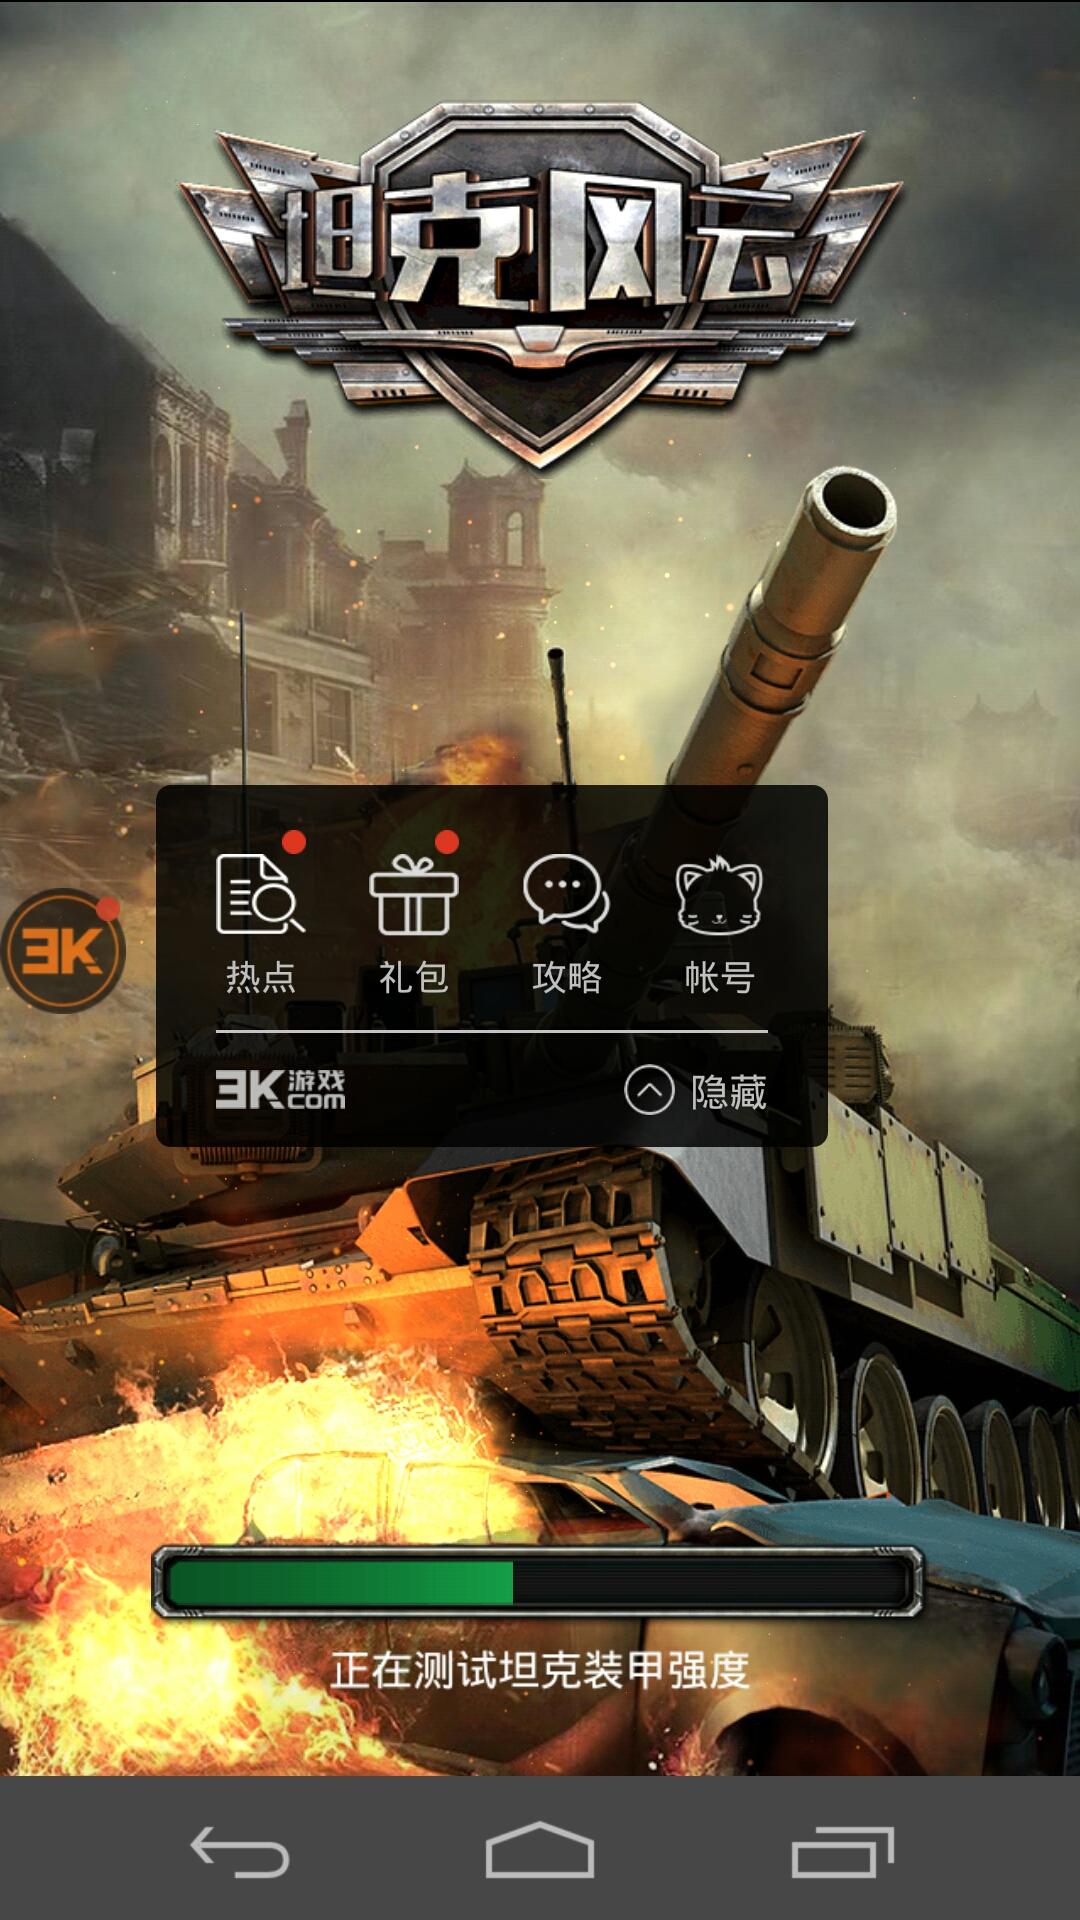 手机游戏 坦克风云 公告  认证地址: http://www.kkk5.com/index.php?